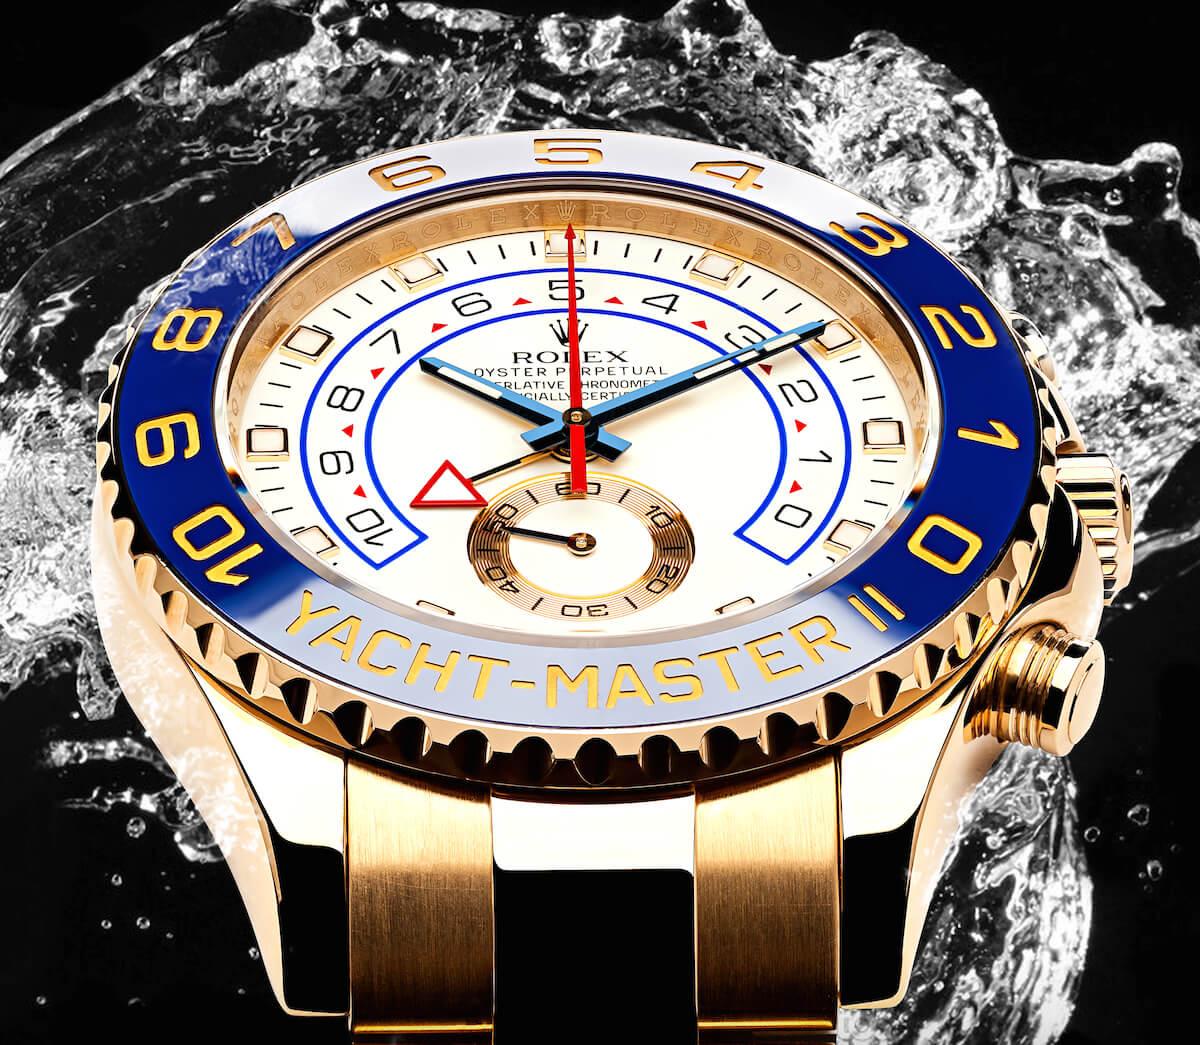 Rolex yellow gold Yacht-Master II ref. 116688